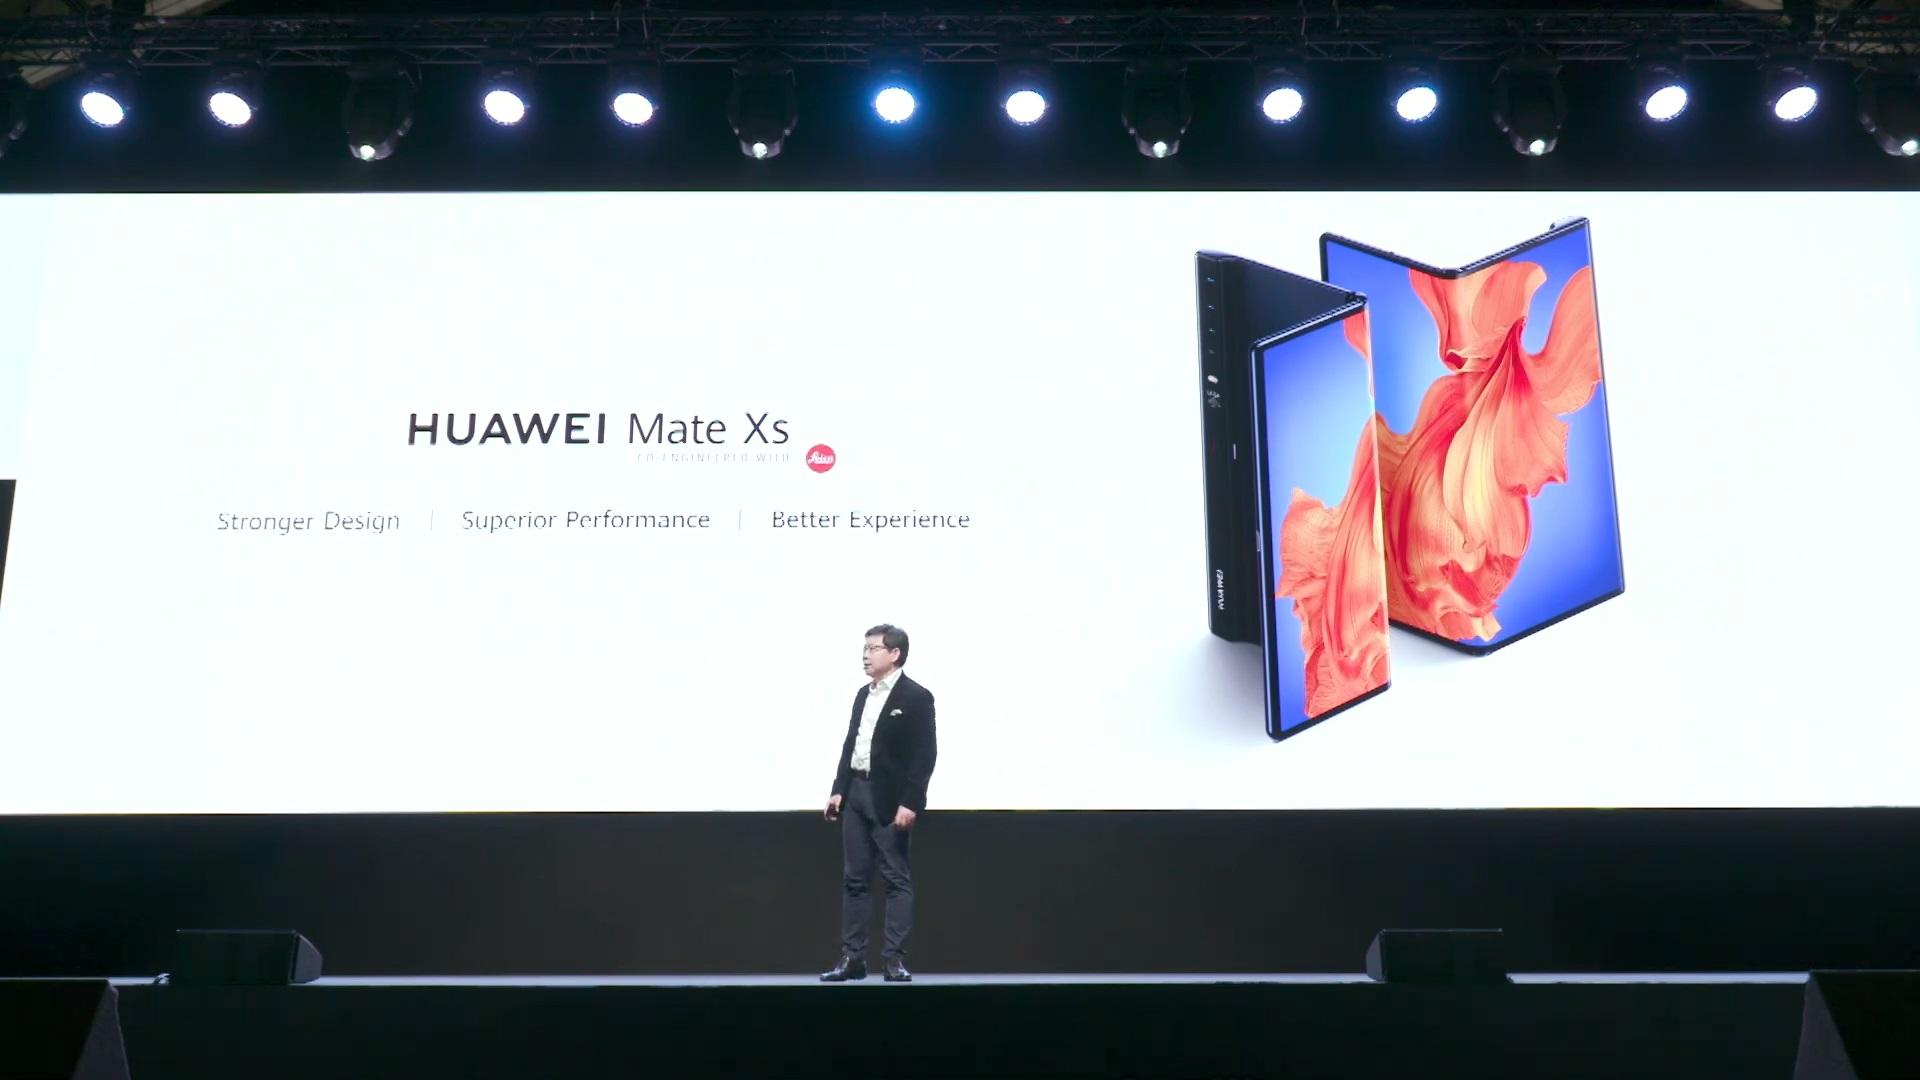 składany smartfon Huawei Mate Xs